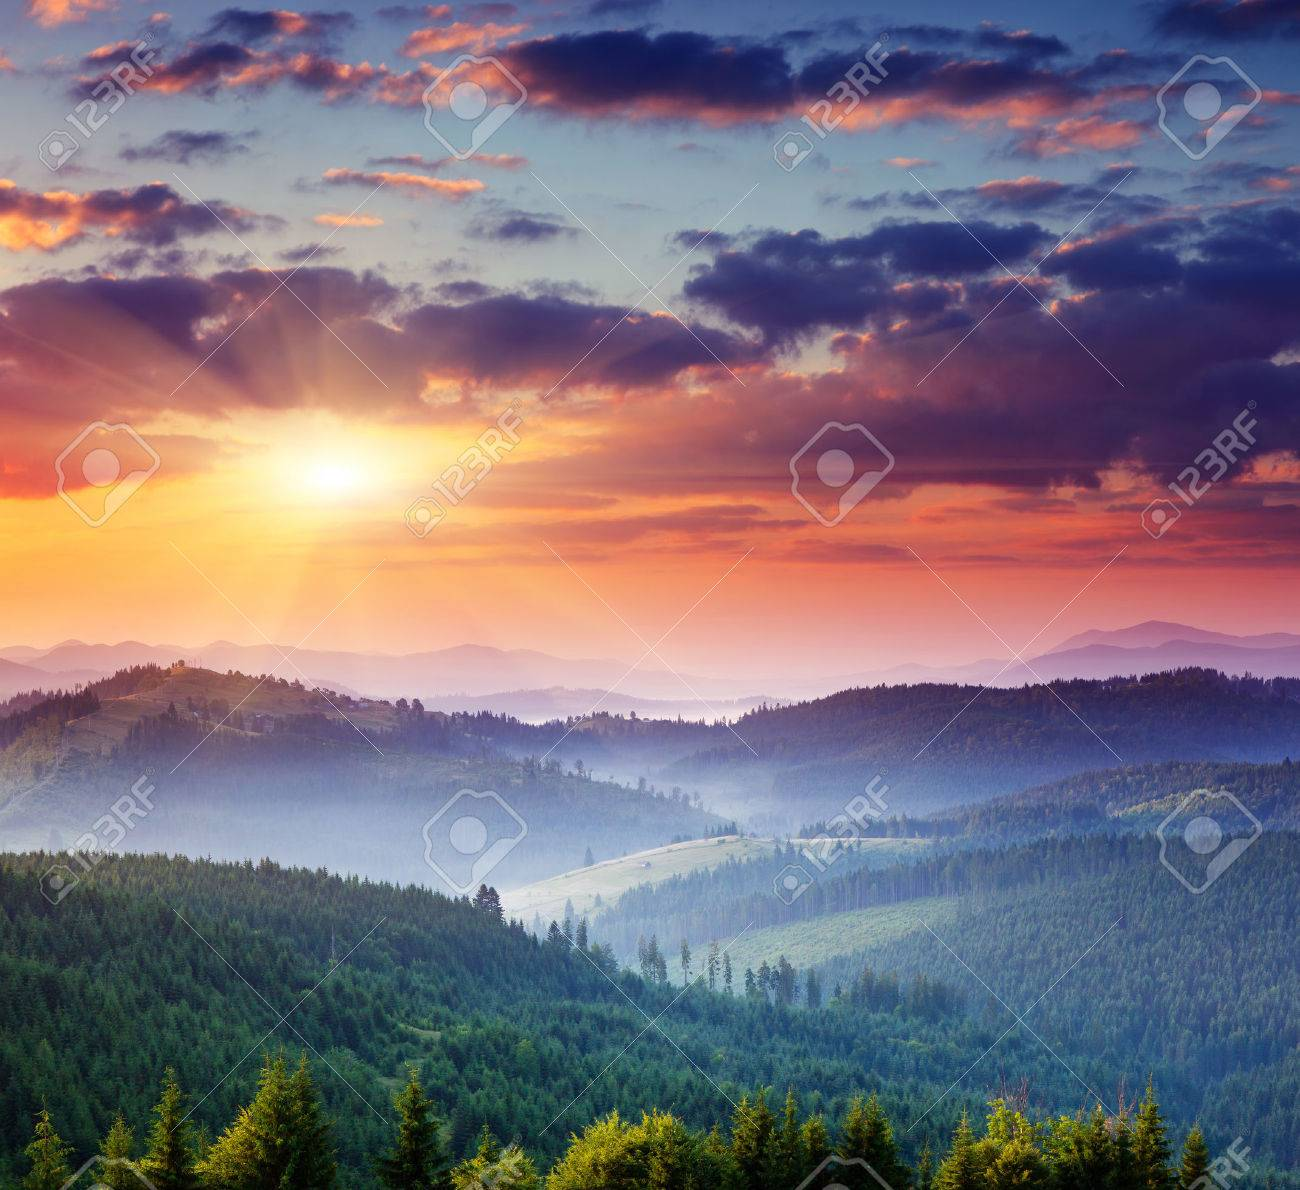 Majestic sunset in the mountains landscape.Carpathian, Ukraine. Stock Photo - 30262051